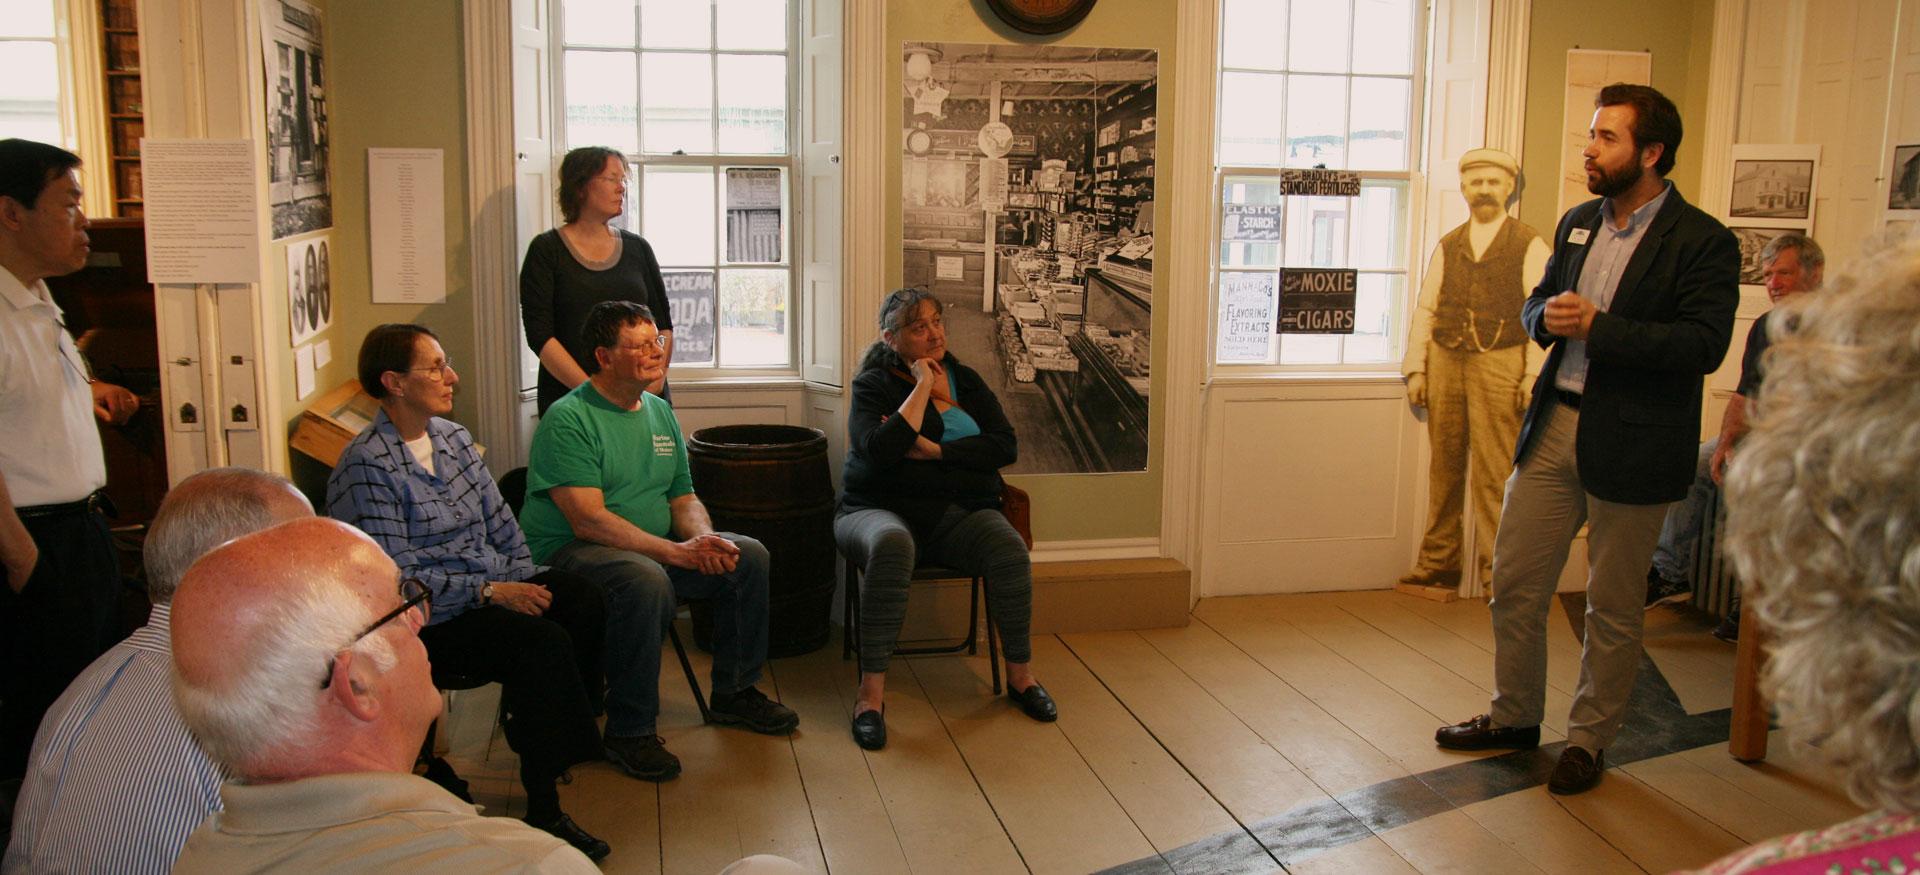 Exhibits at Freeport Historical Society